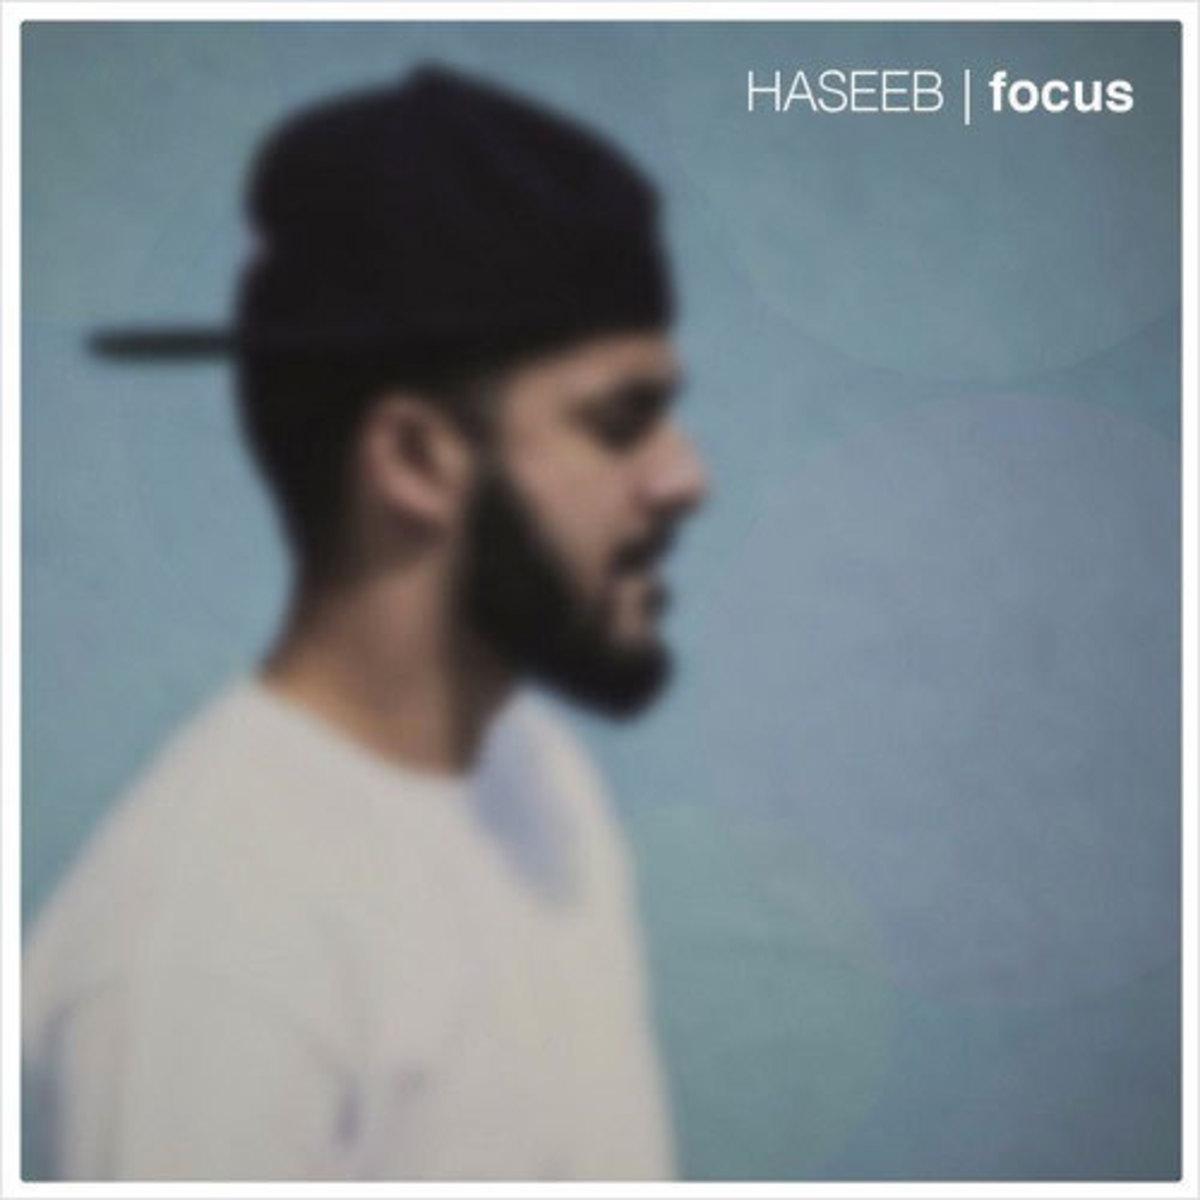 haseeb-focus.jpg